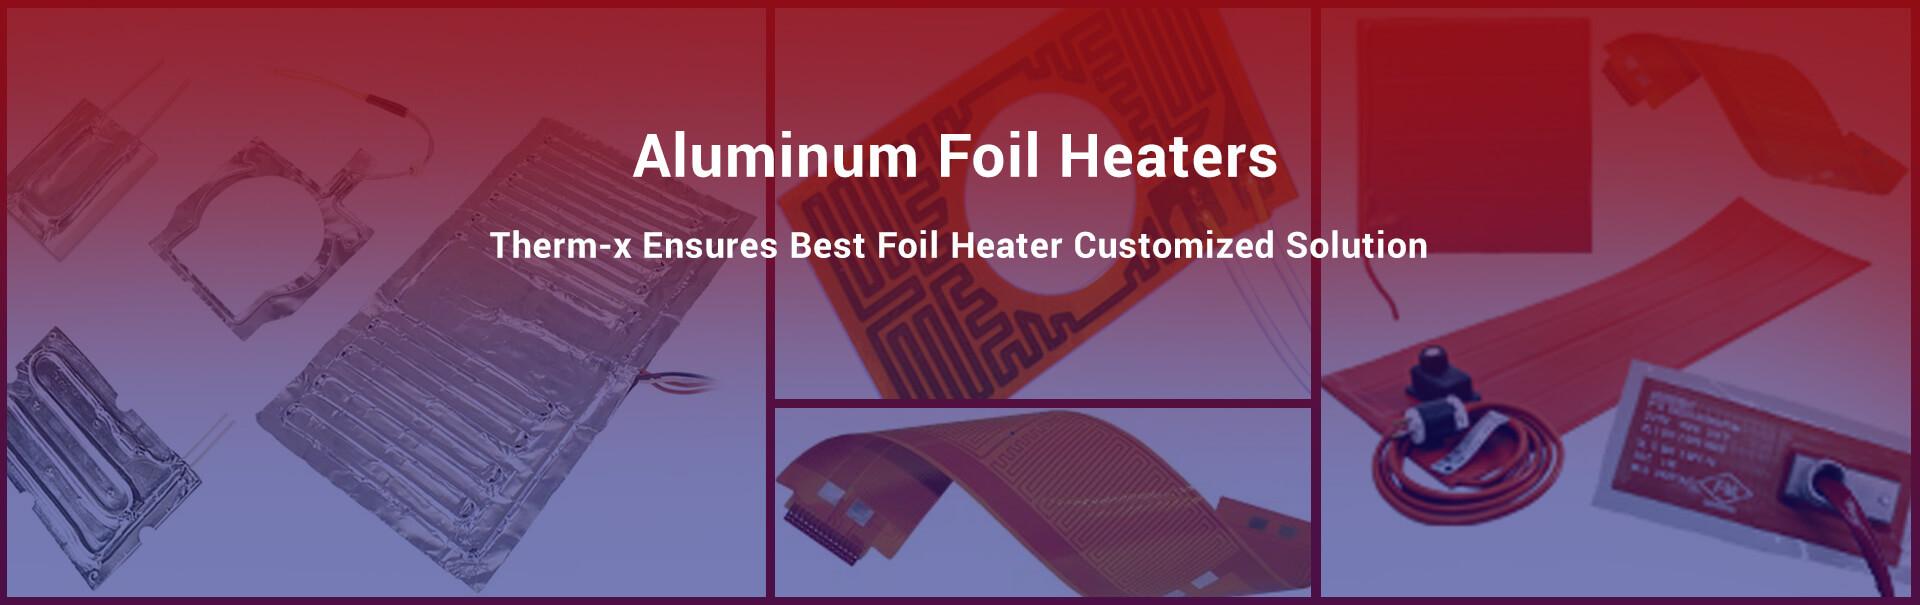 Aluminum Foil Heaters